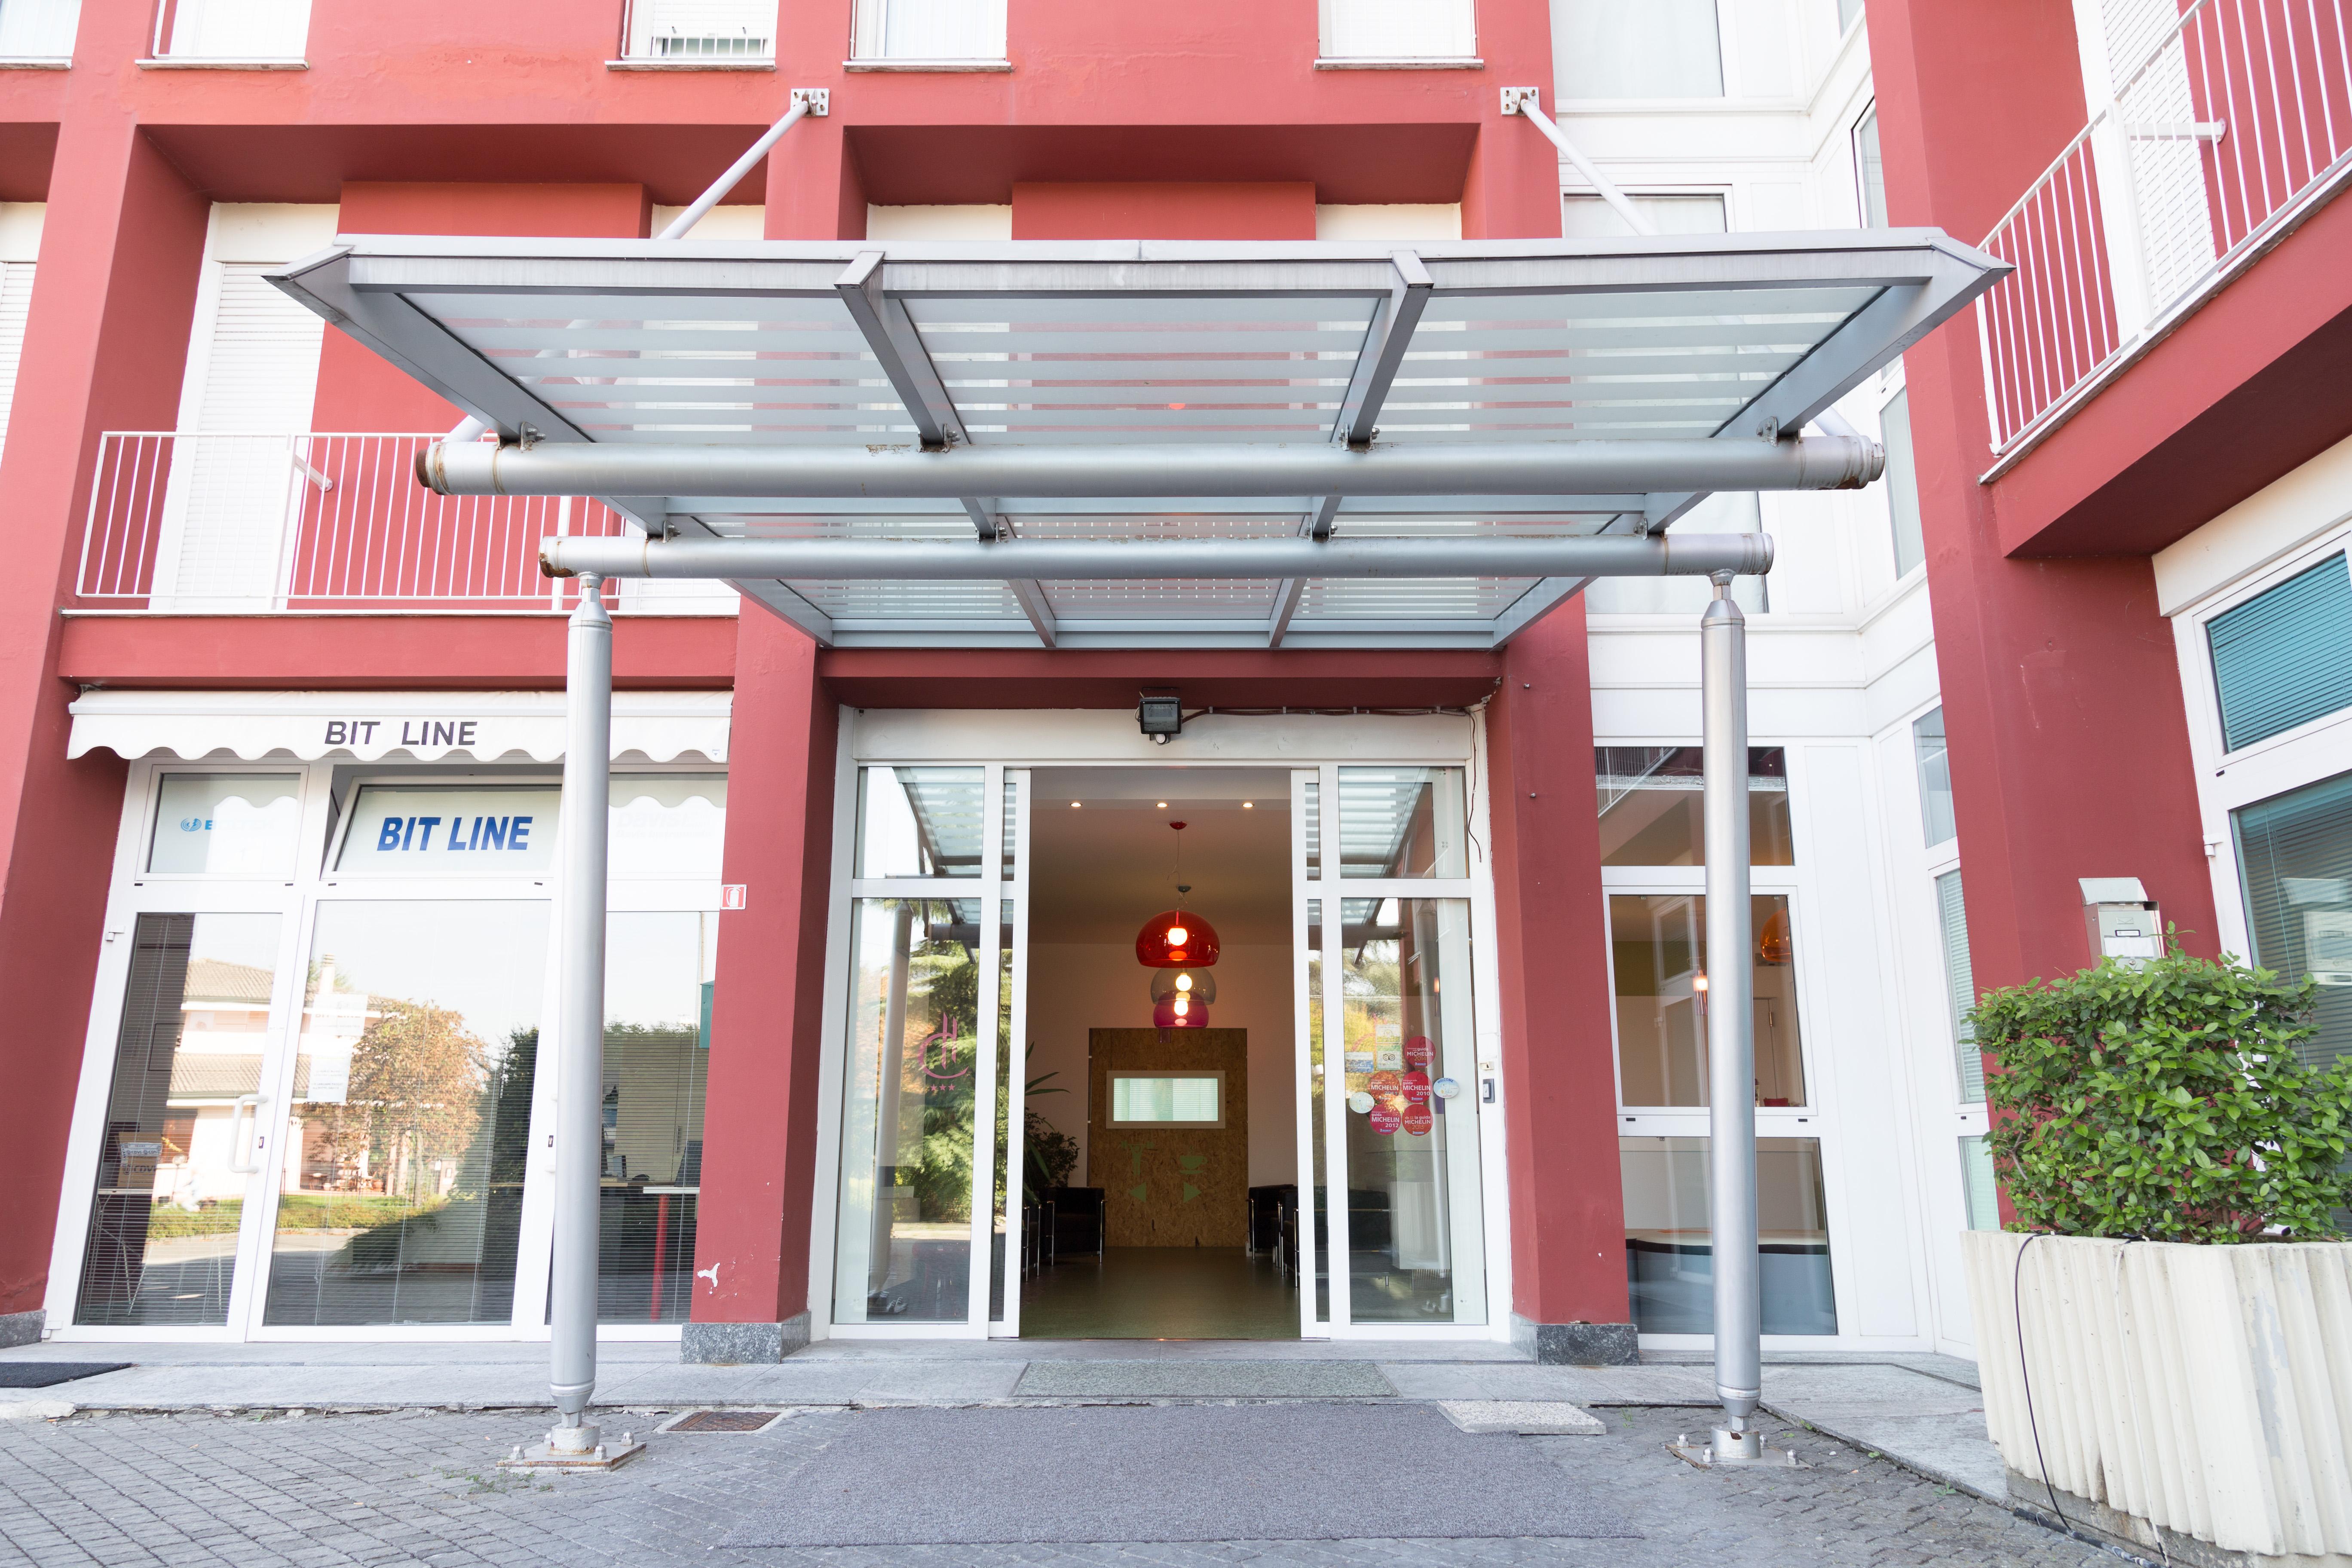 Hotel Parma e dintorni Hotel Campus